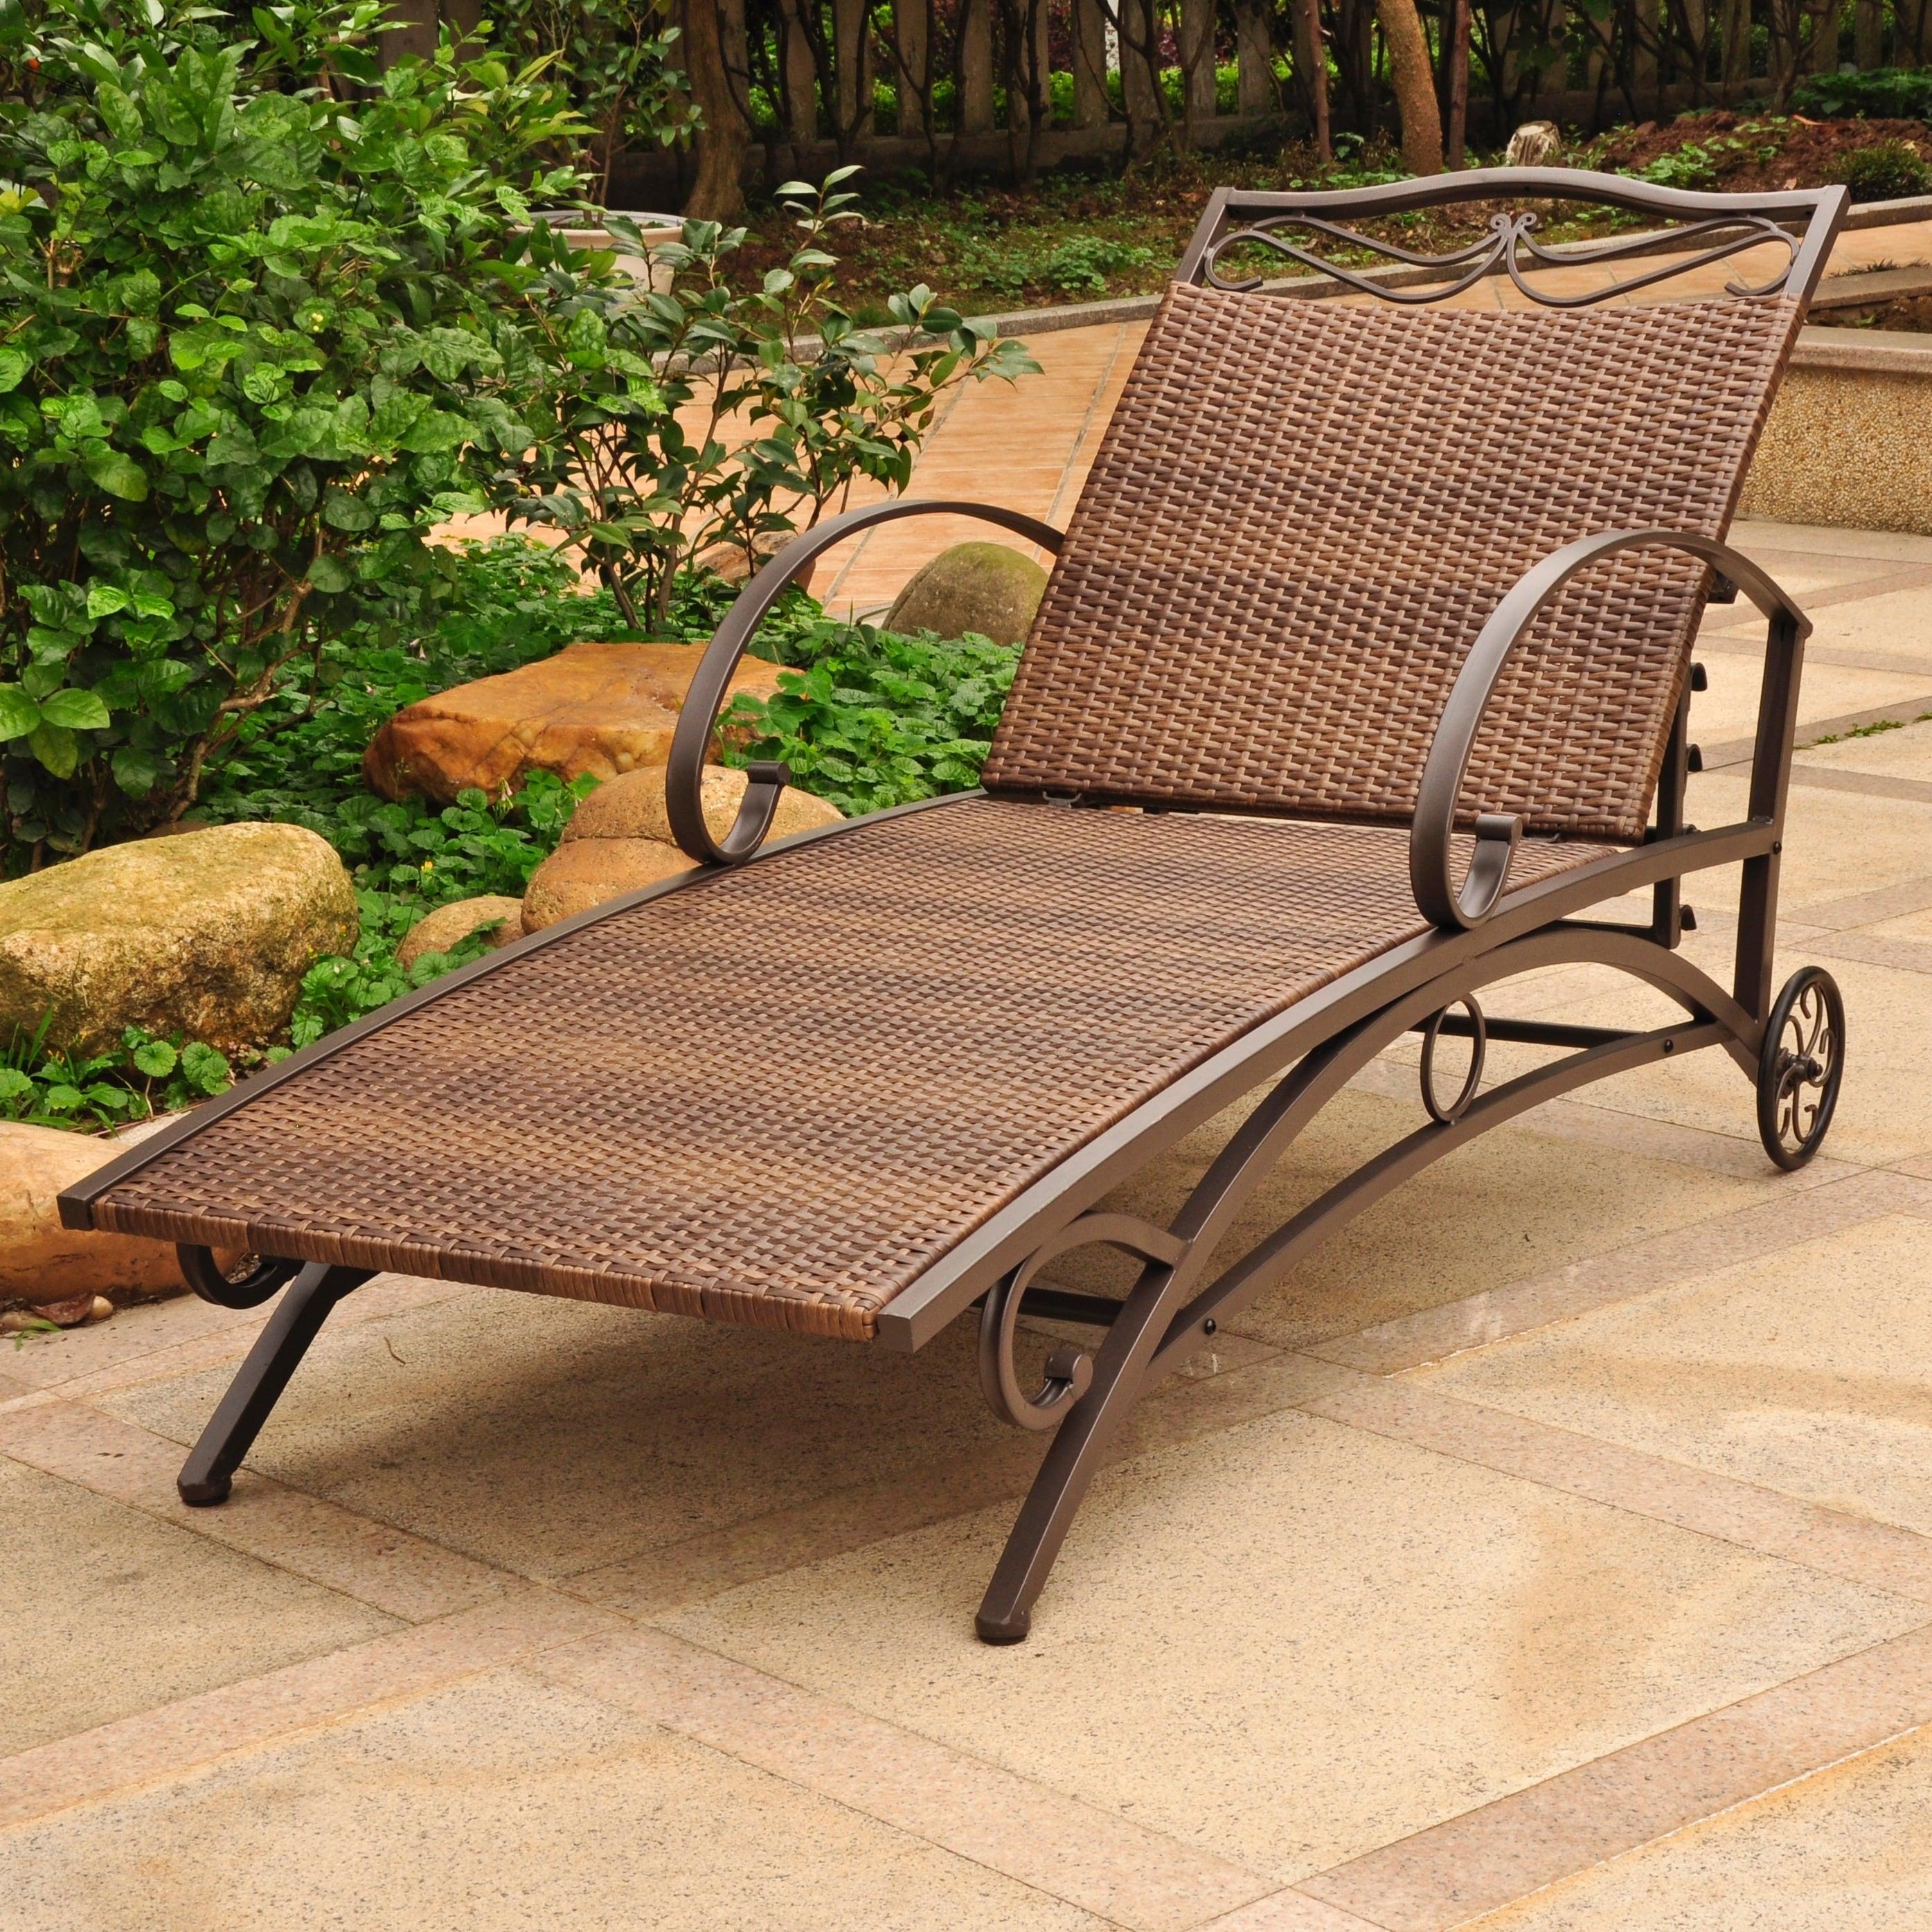 International caravan valencia resin wicker steel frame multi position chaise lounge